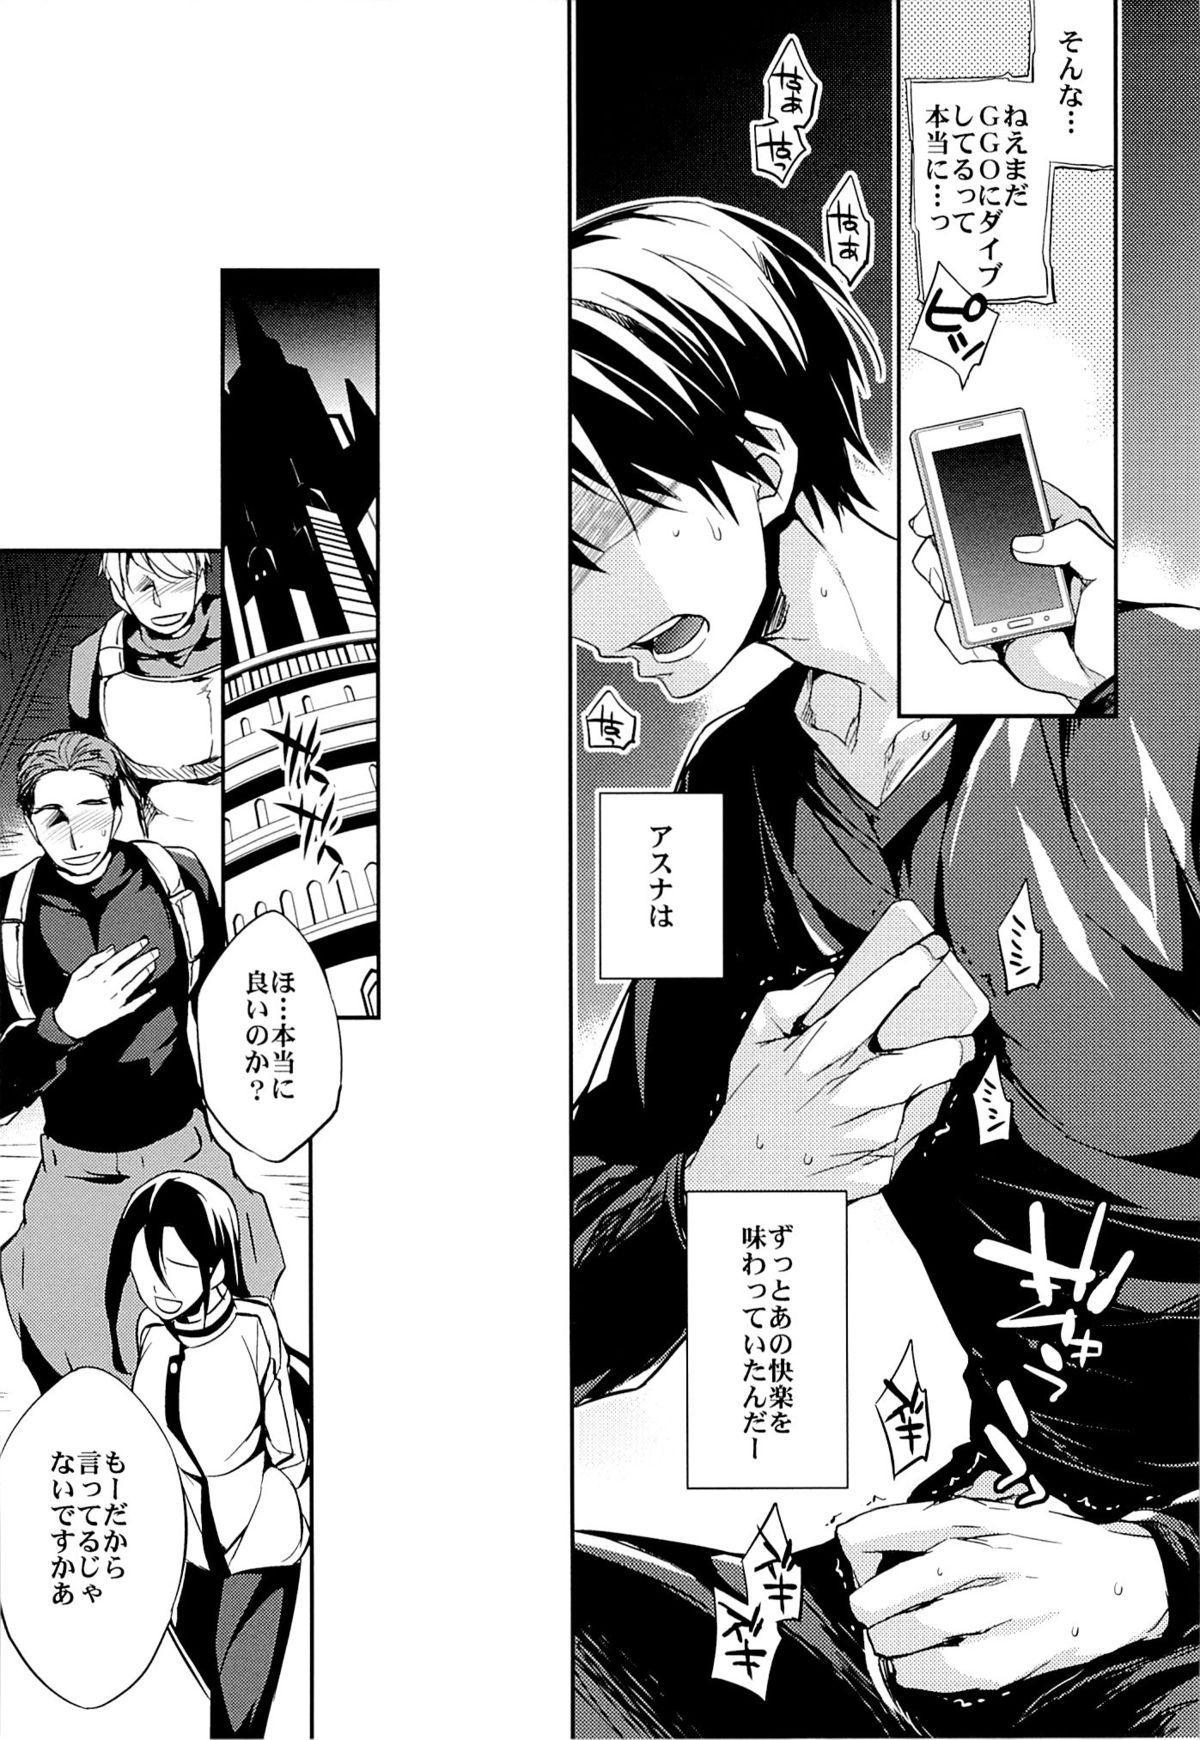 (SC65) [Crazy9 (Ichitaka)] C9-14 TS~Kirito-chan no Avatar wa Random Nyotai (Sword Art Online) 14